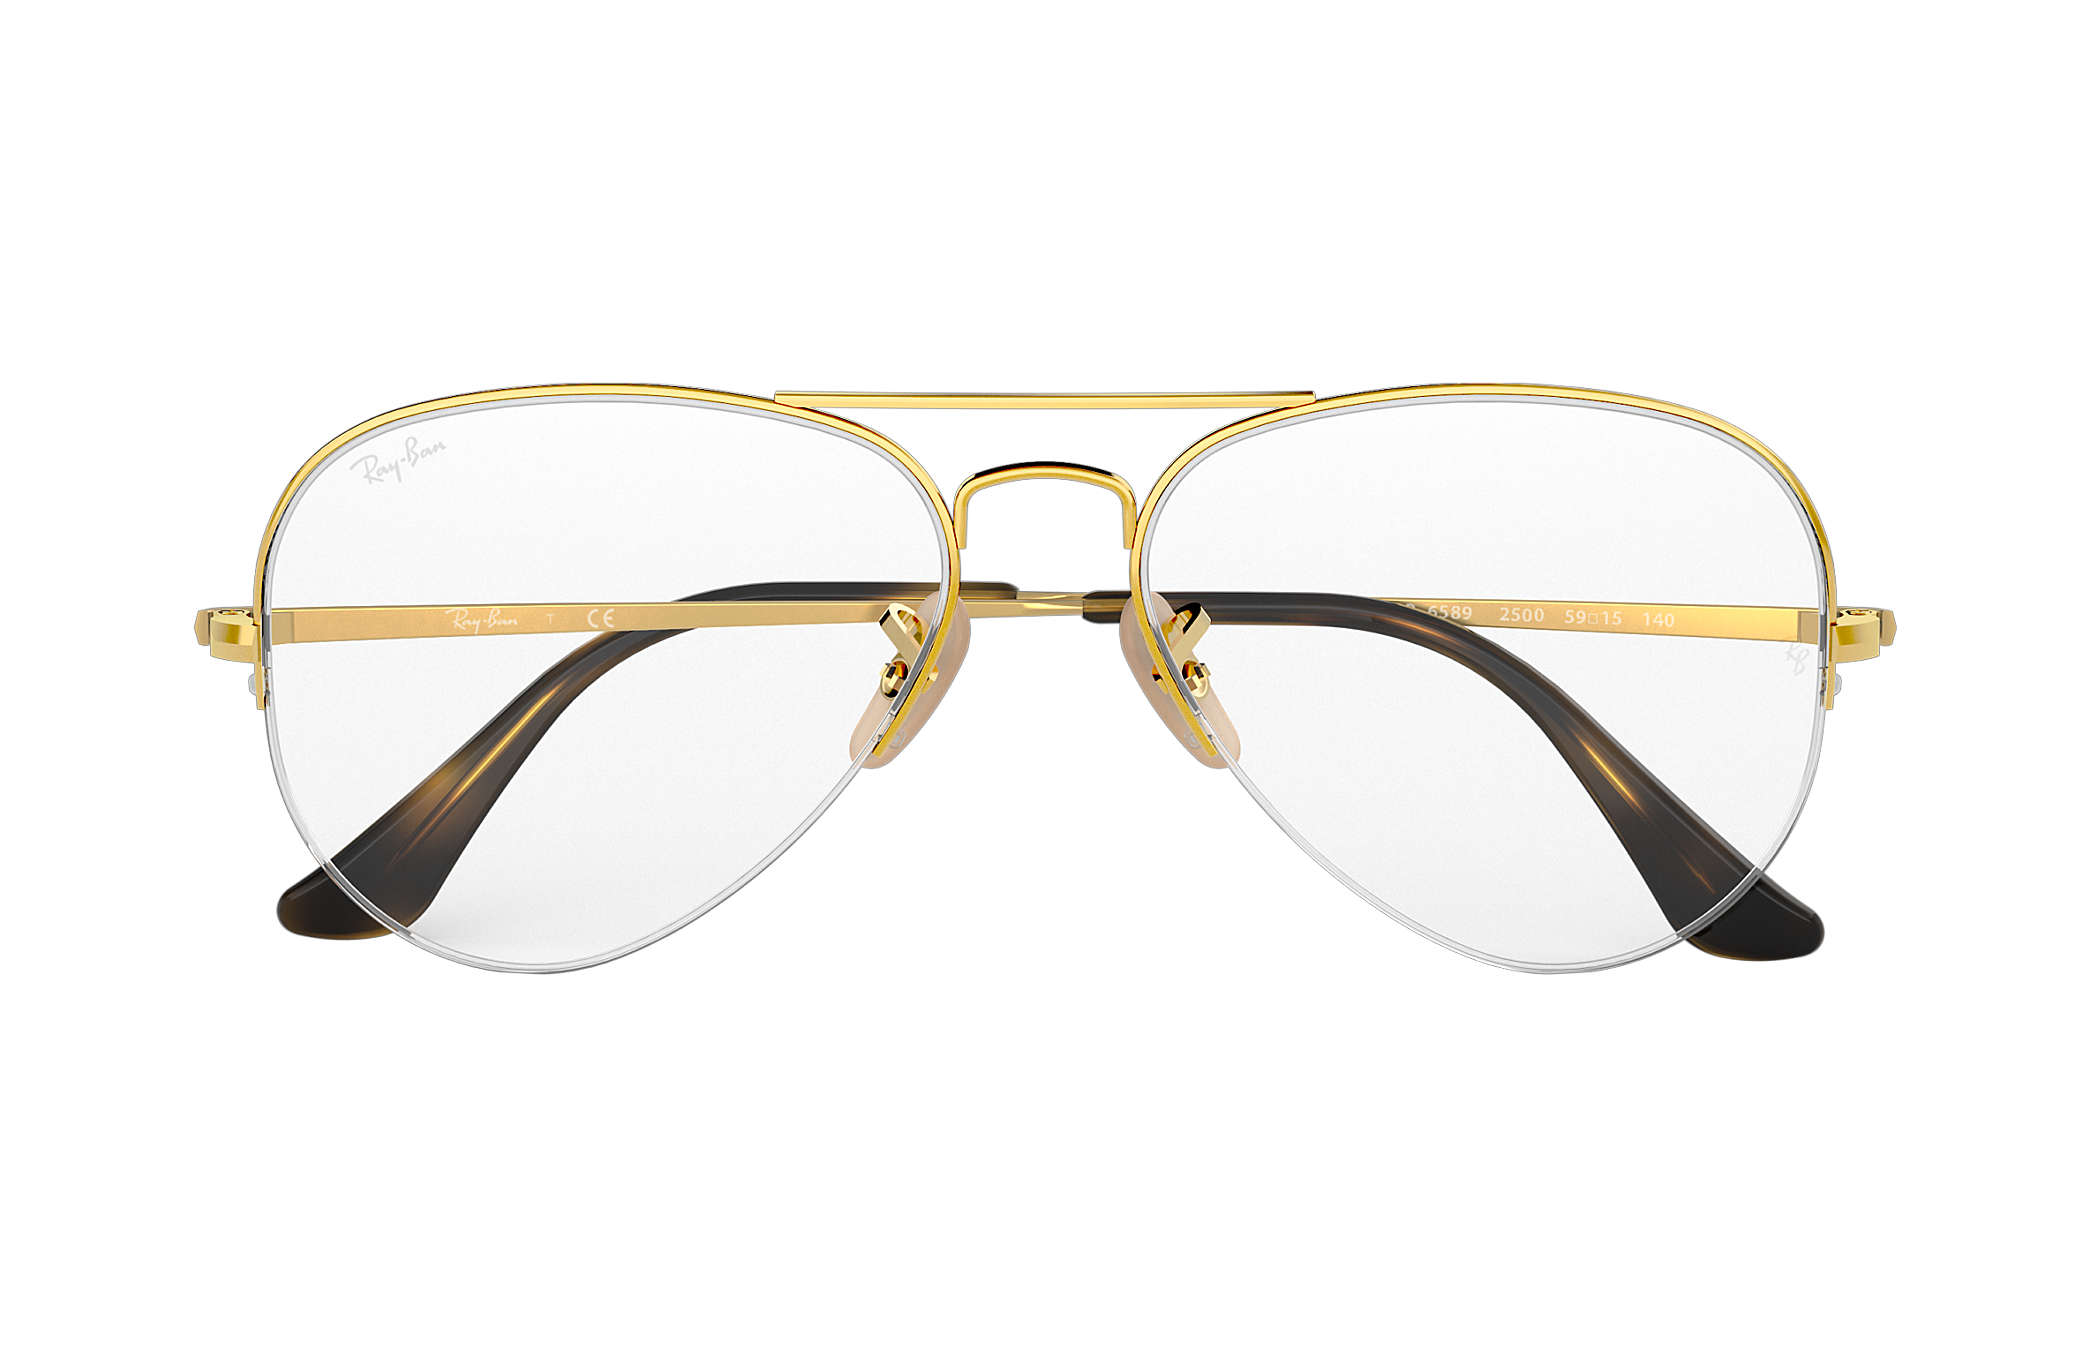 ee55ba0b0 Ray-Ban prescription glasses Aviator Gaze RB6589 Gold - Metal ...